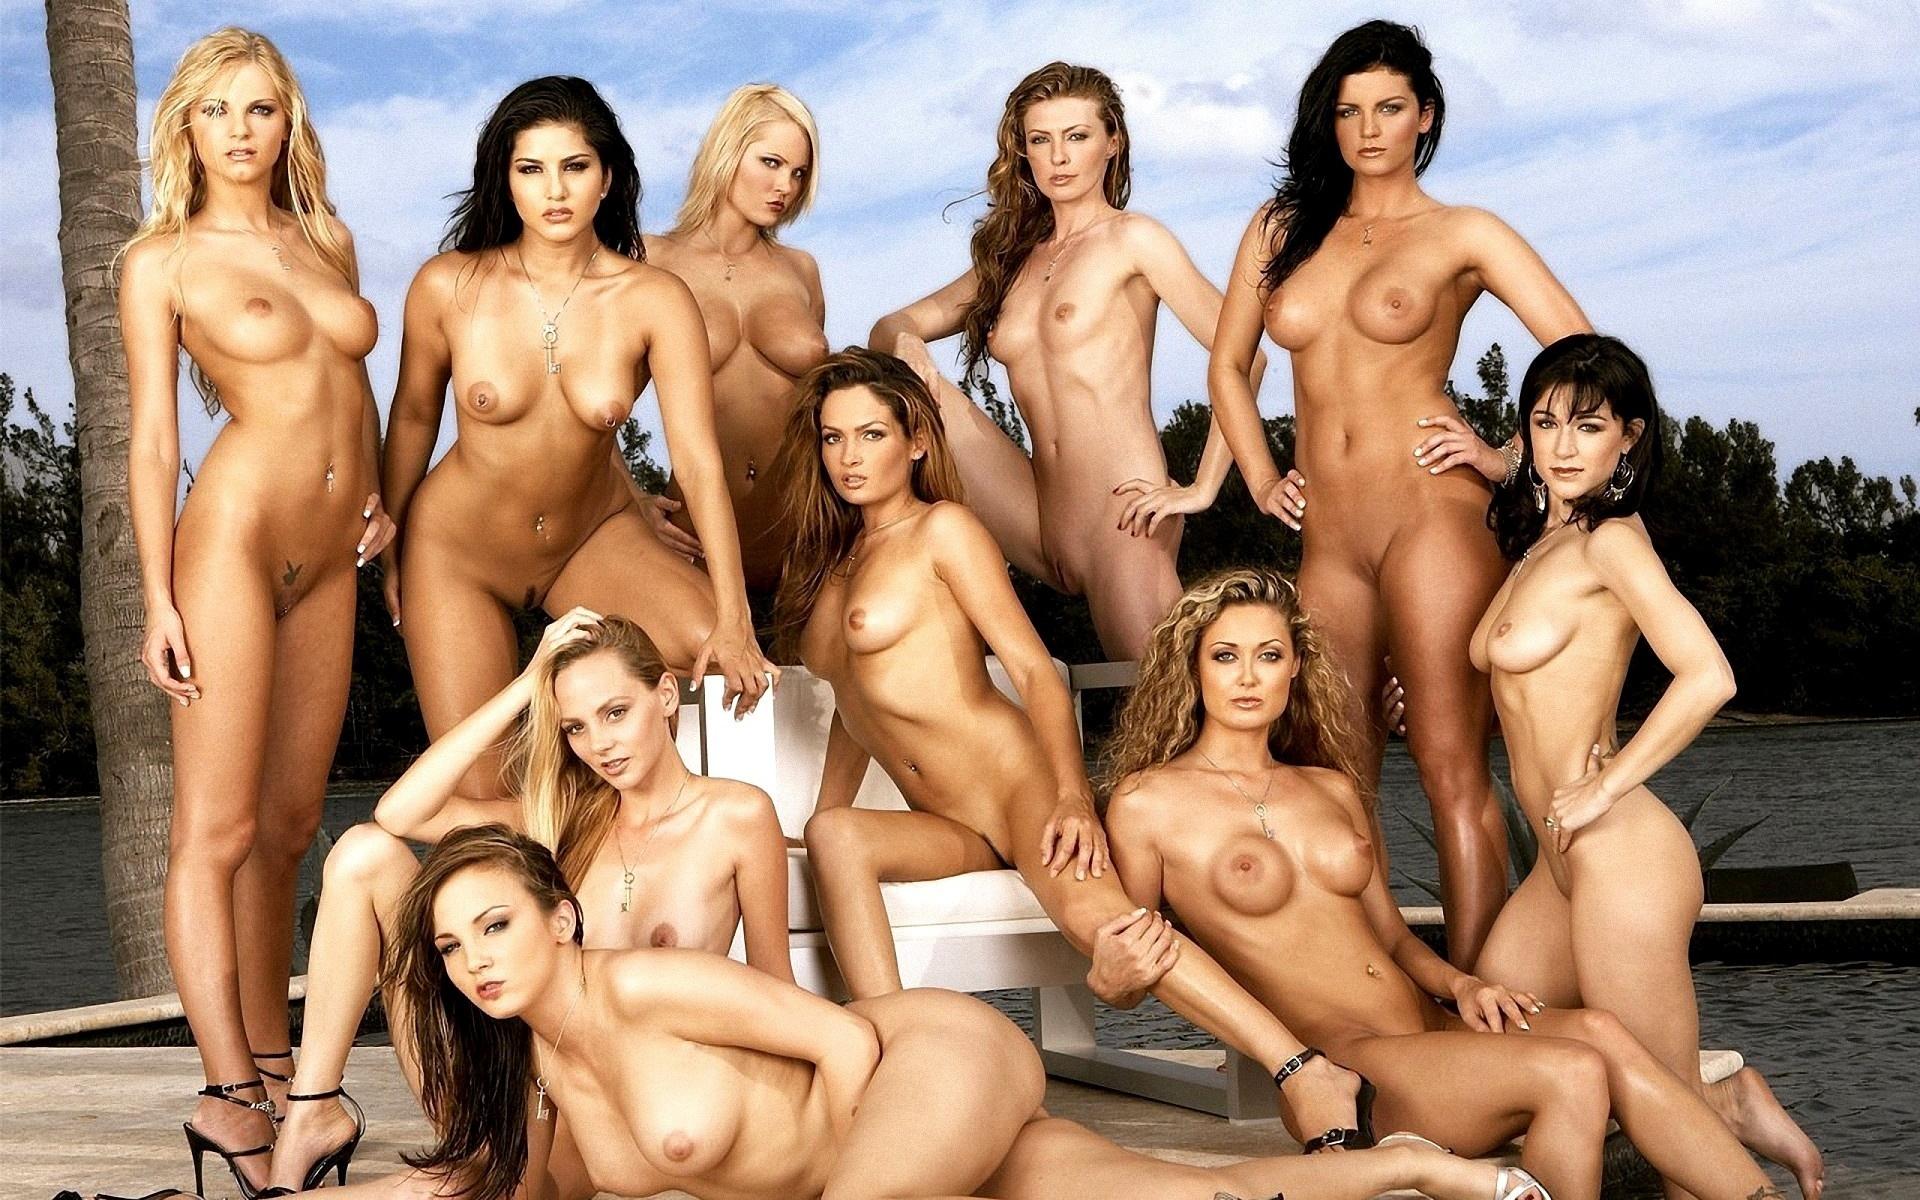 Бабы и девушки голые @ m1bar.com